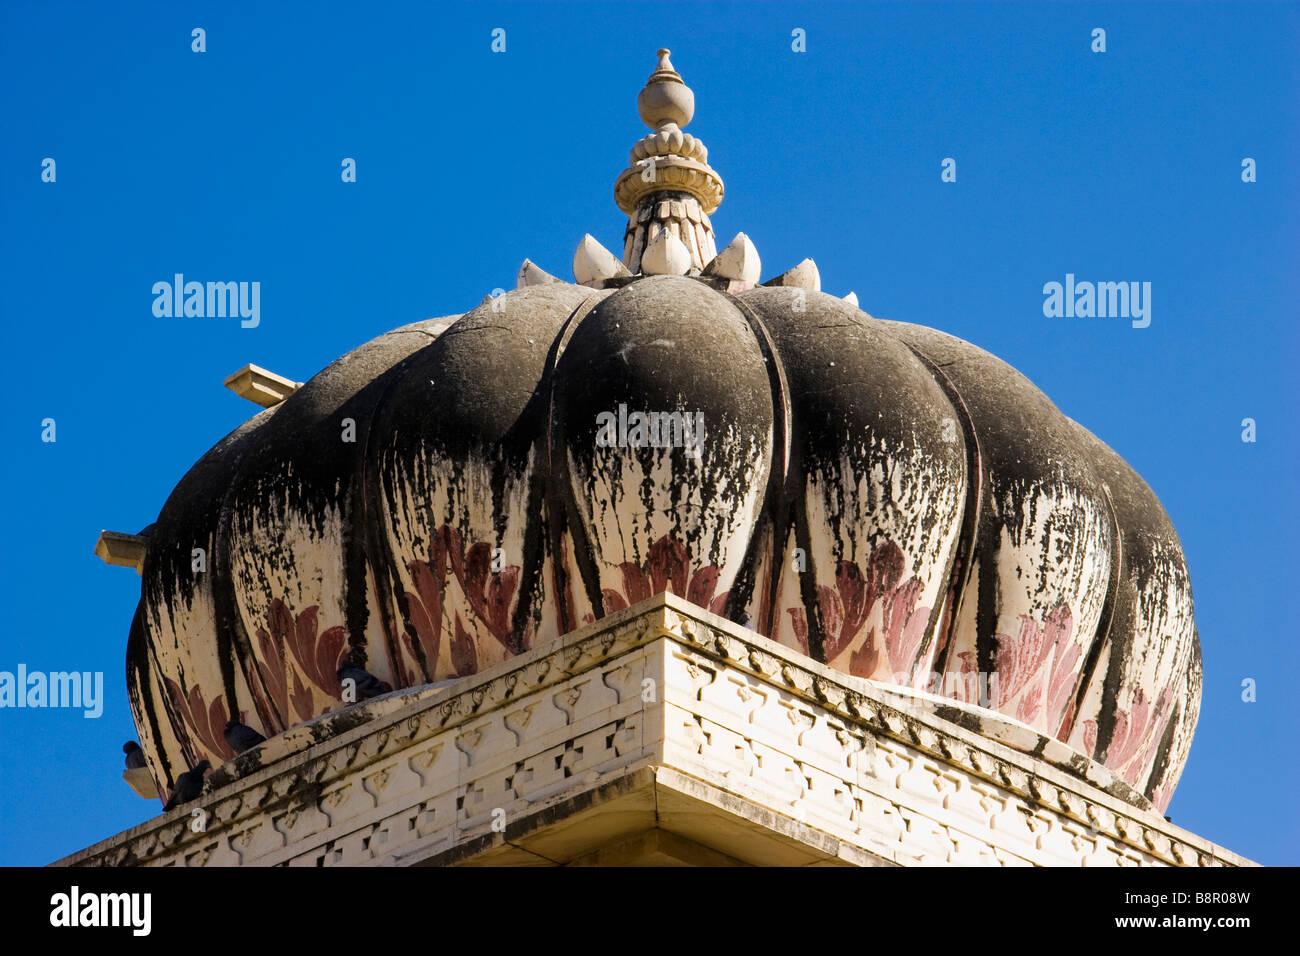 Ahar Rajasthan India - Stock Image